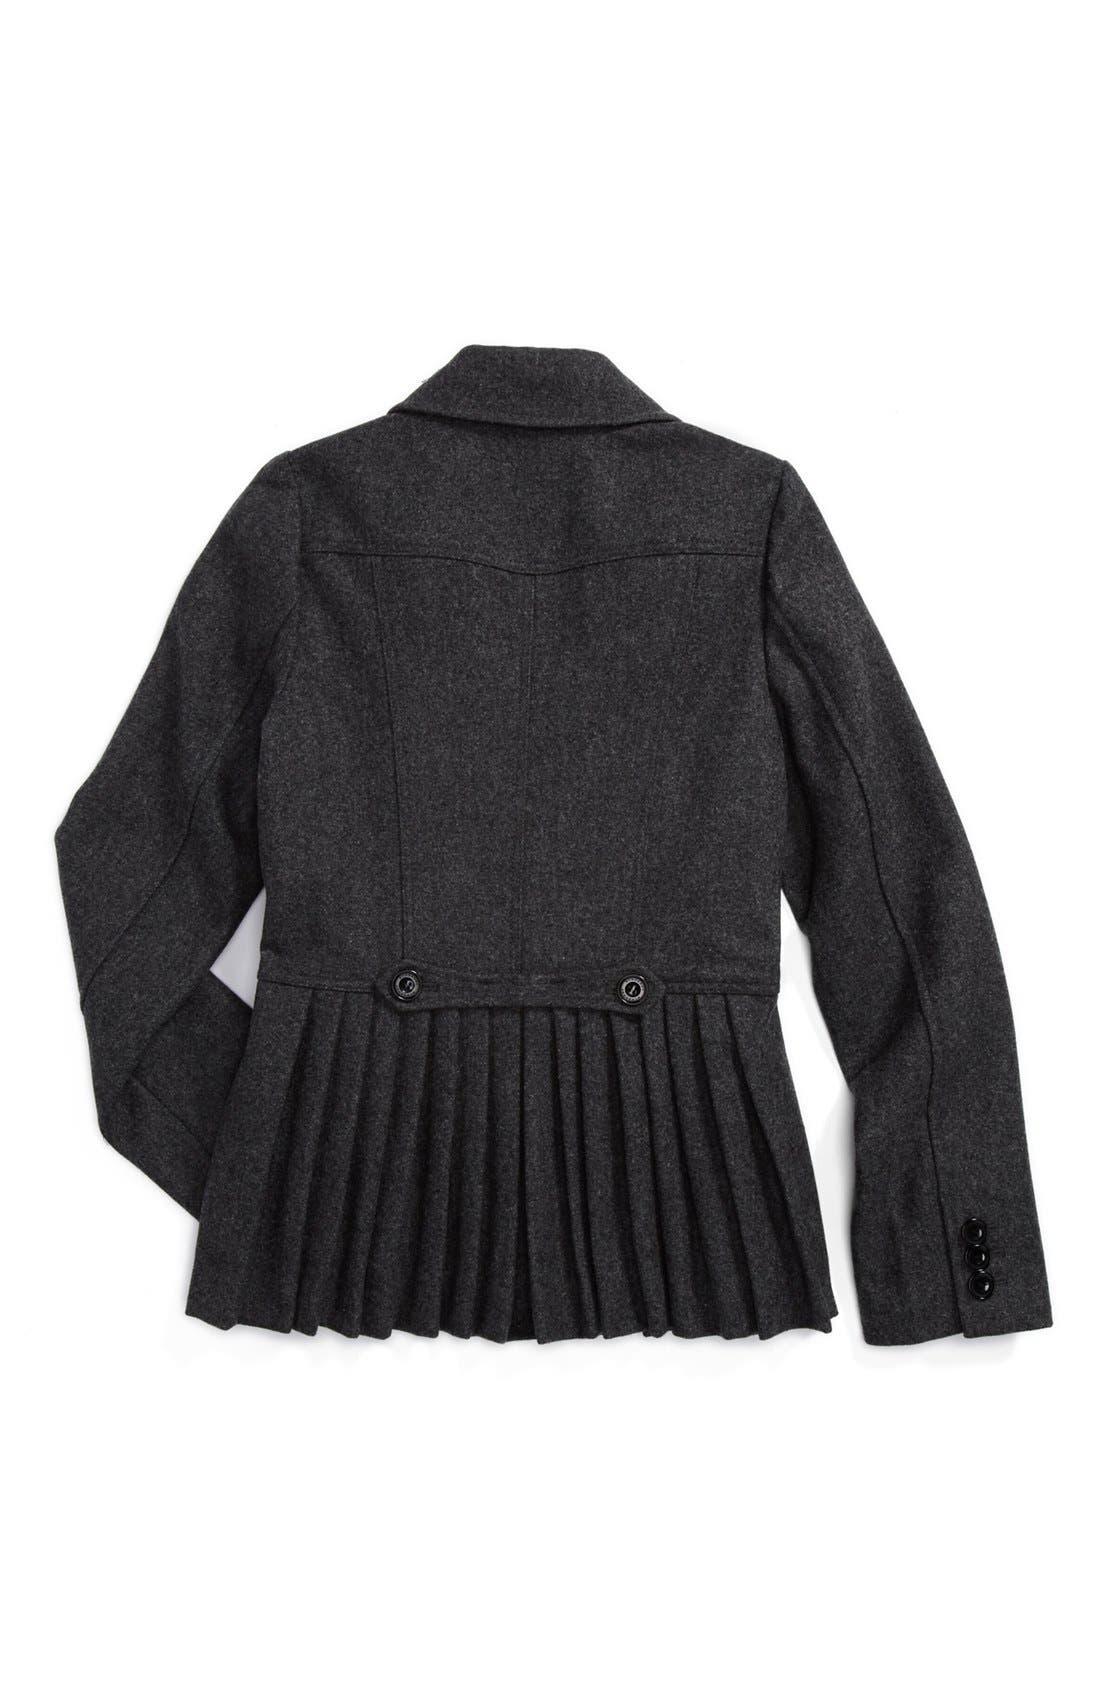 Alternate Image 2  - Burberry Tailored Jacket (Little Girls & Big Girls)